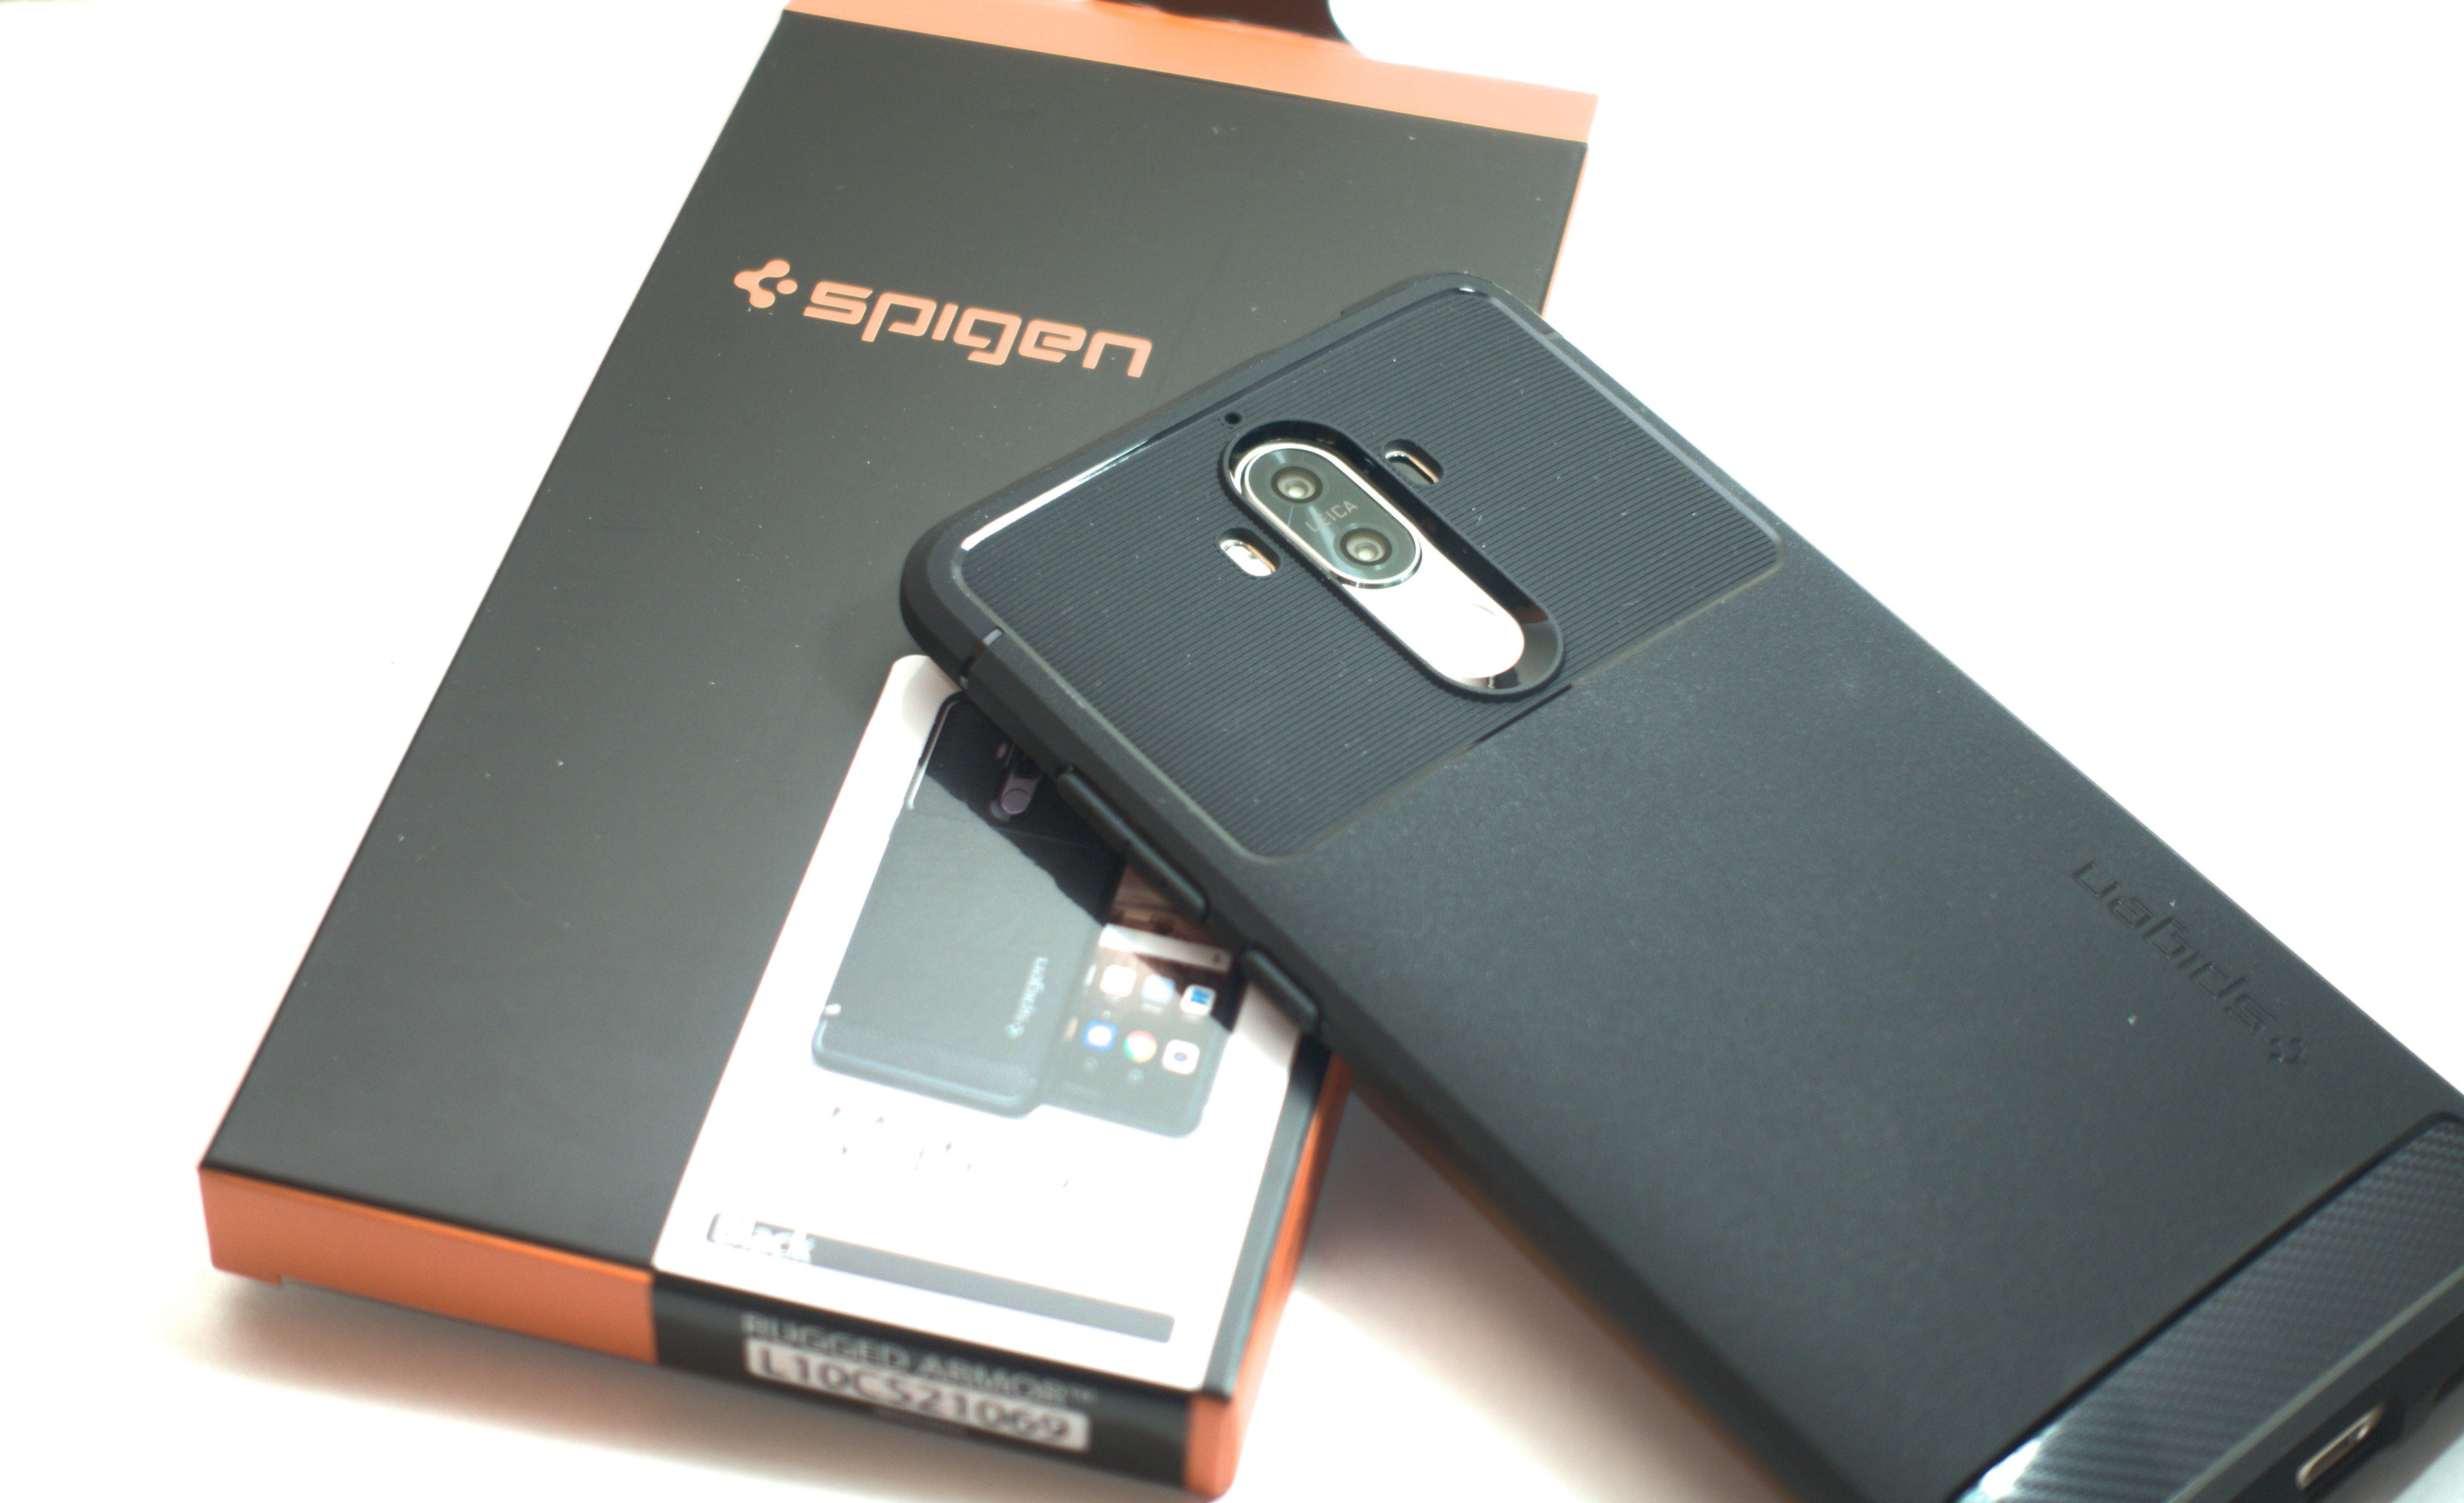 Huawei Mate 9用のケースにはSpigenのラギッド・アーマーが良い感じ